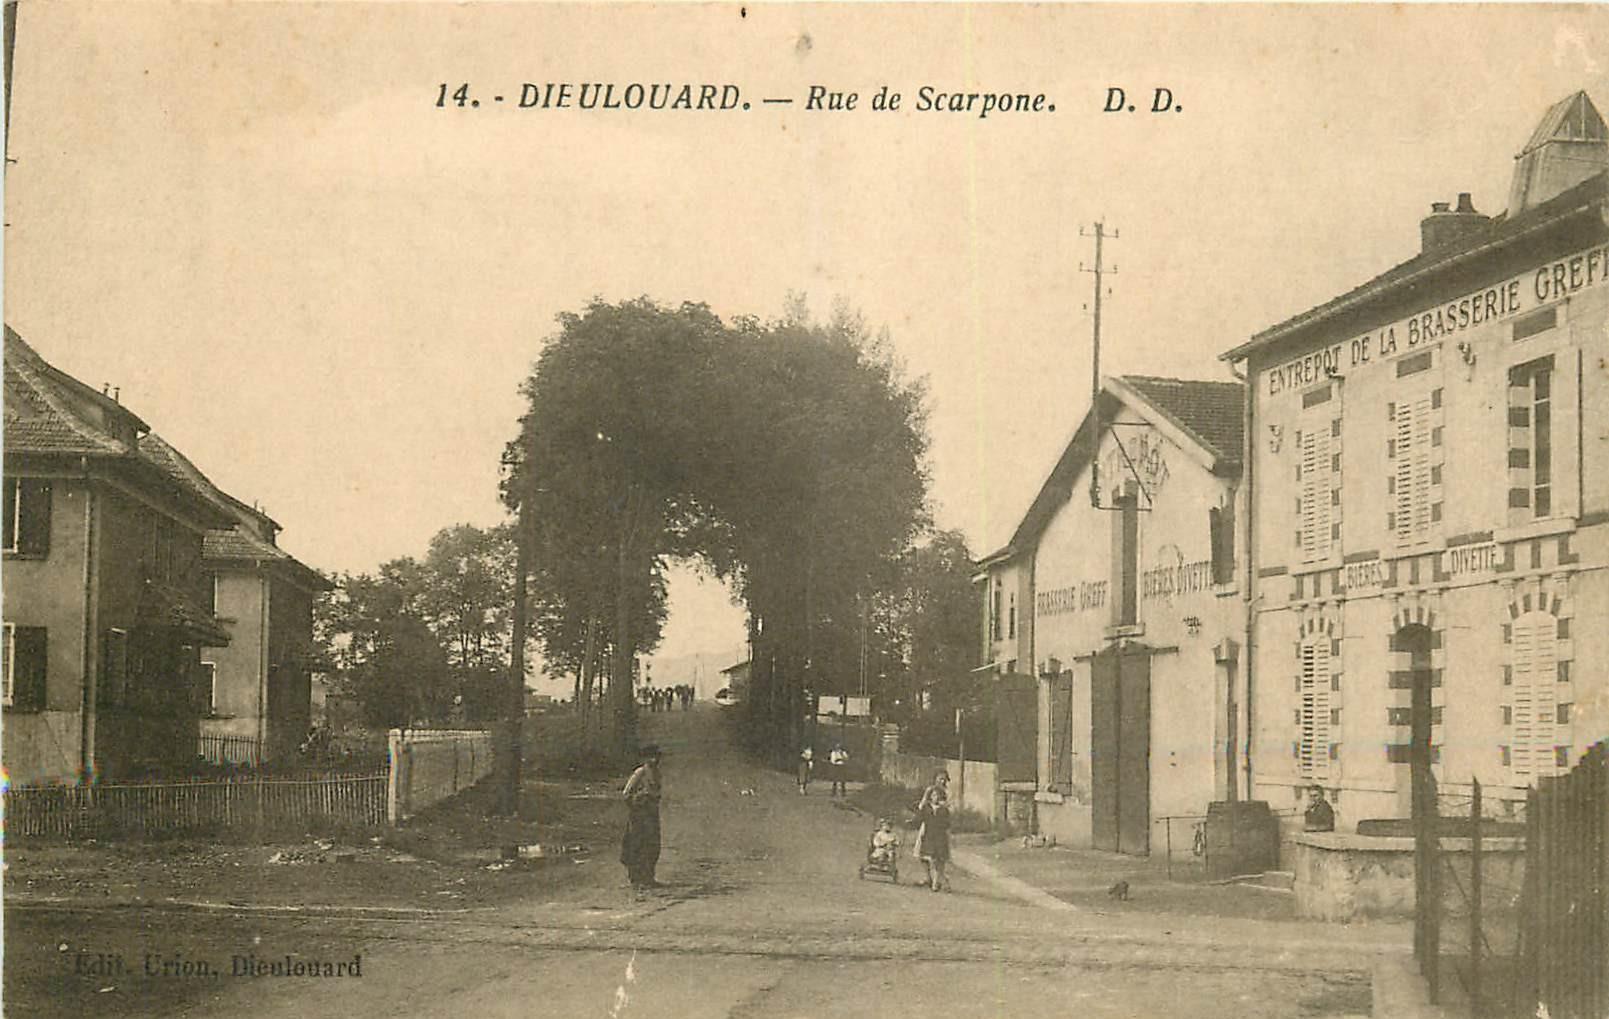 WW 54 DIEULOUARD. Entrepôt Brasserie Greff rue Scarpone